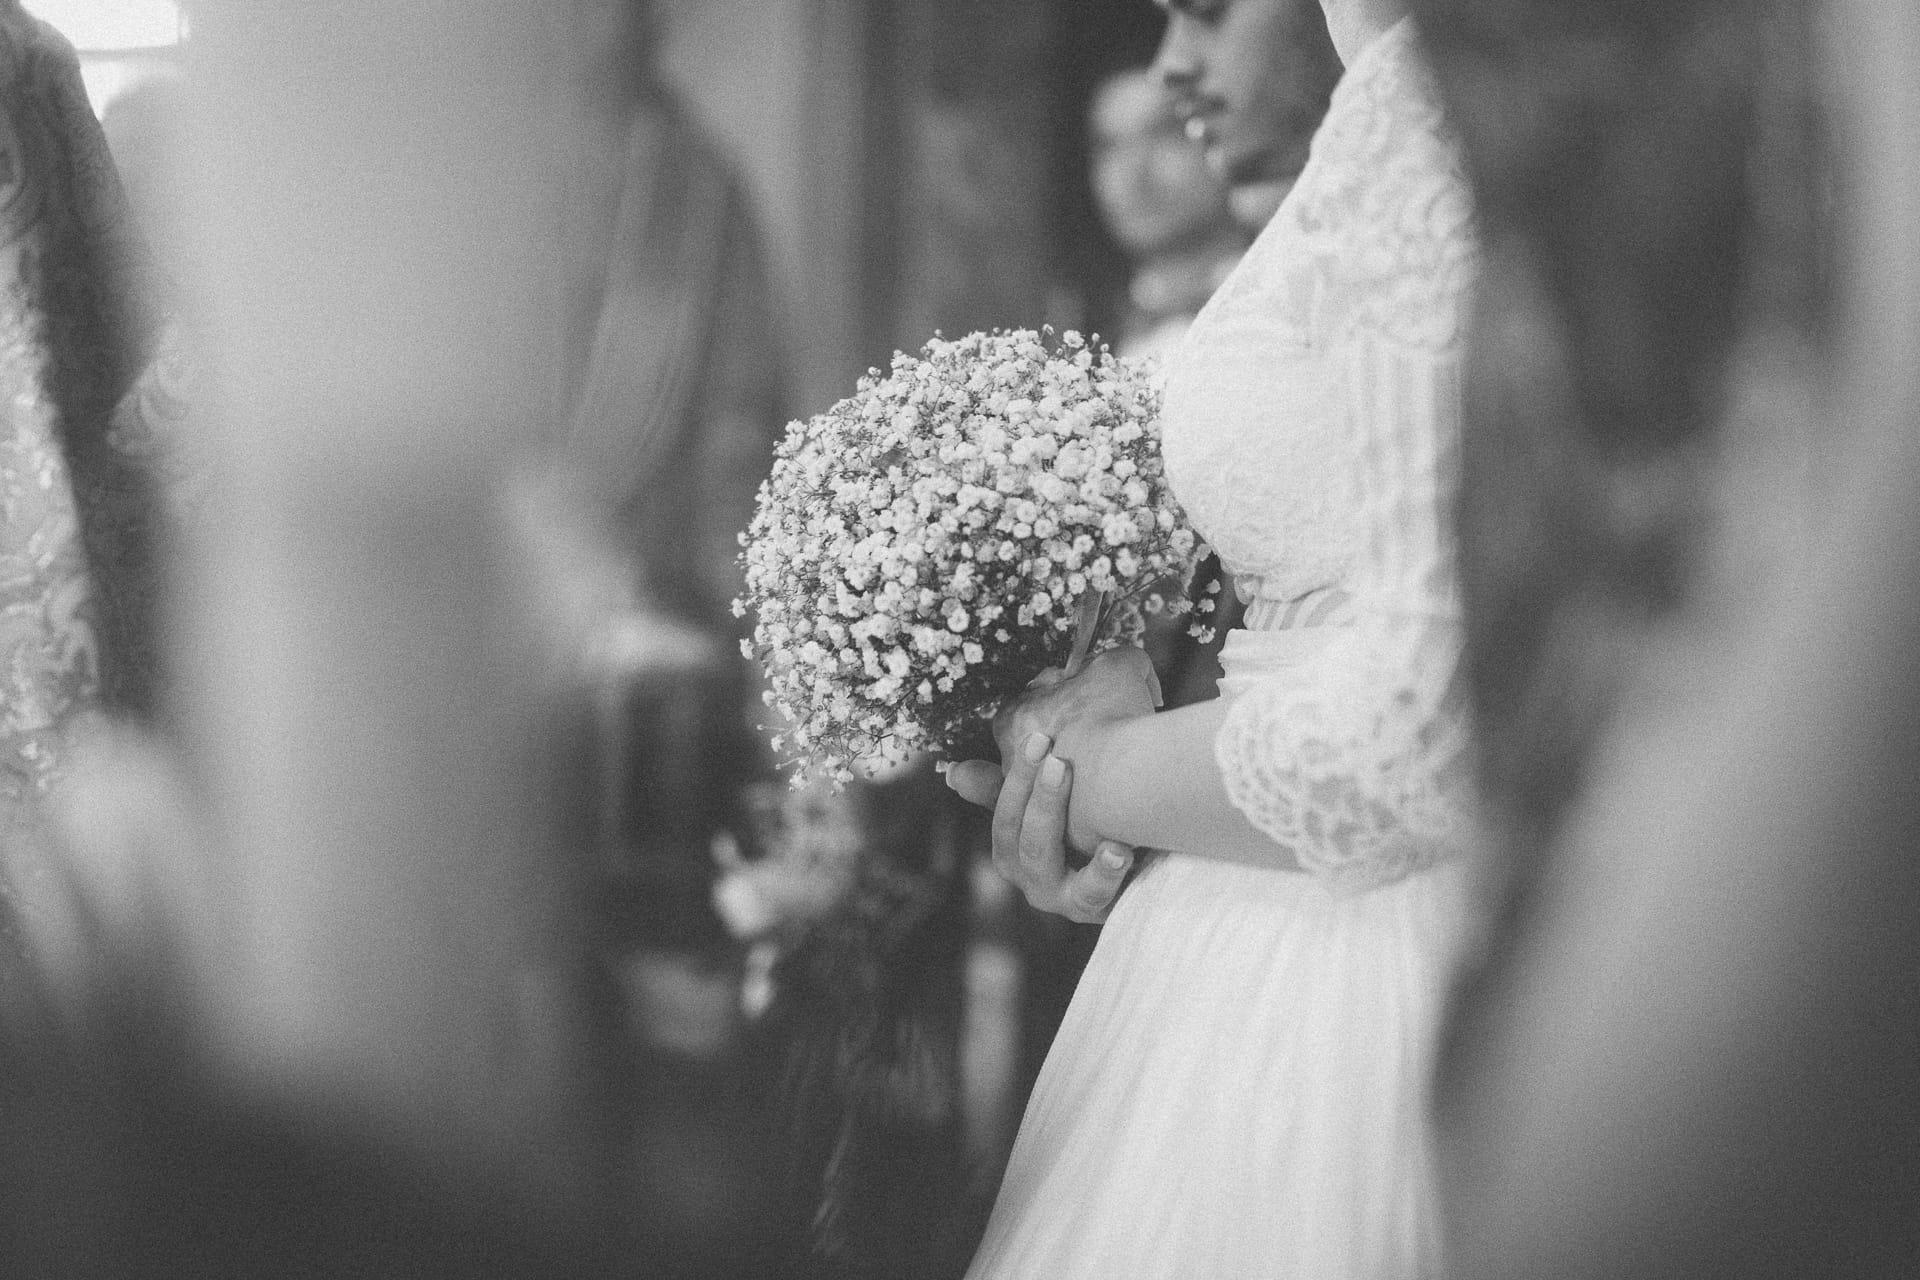 fotograf nunta craiova dragos stoenica raluca si andrei 0212